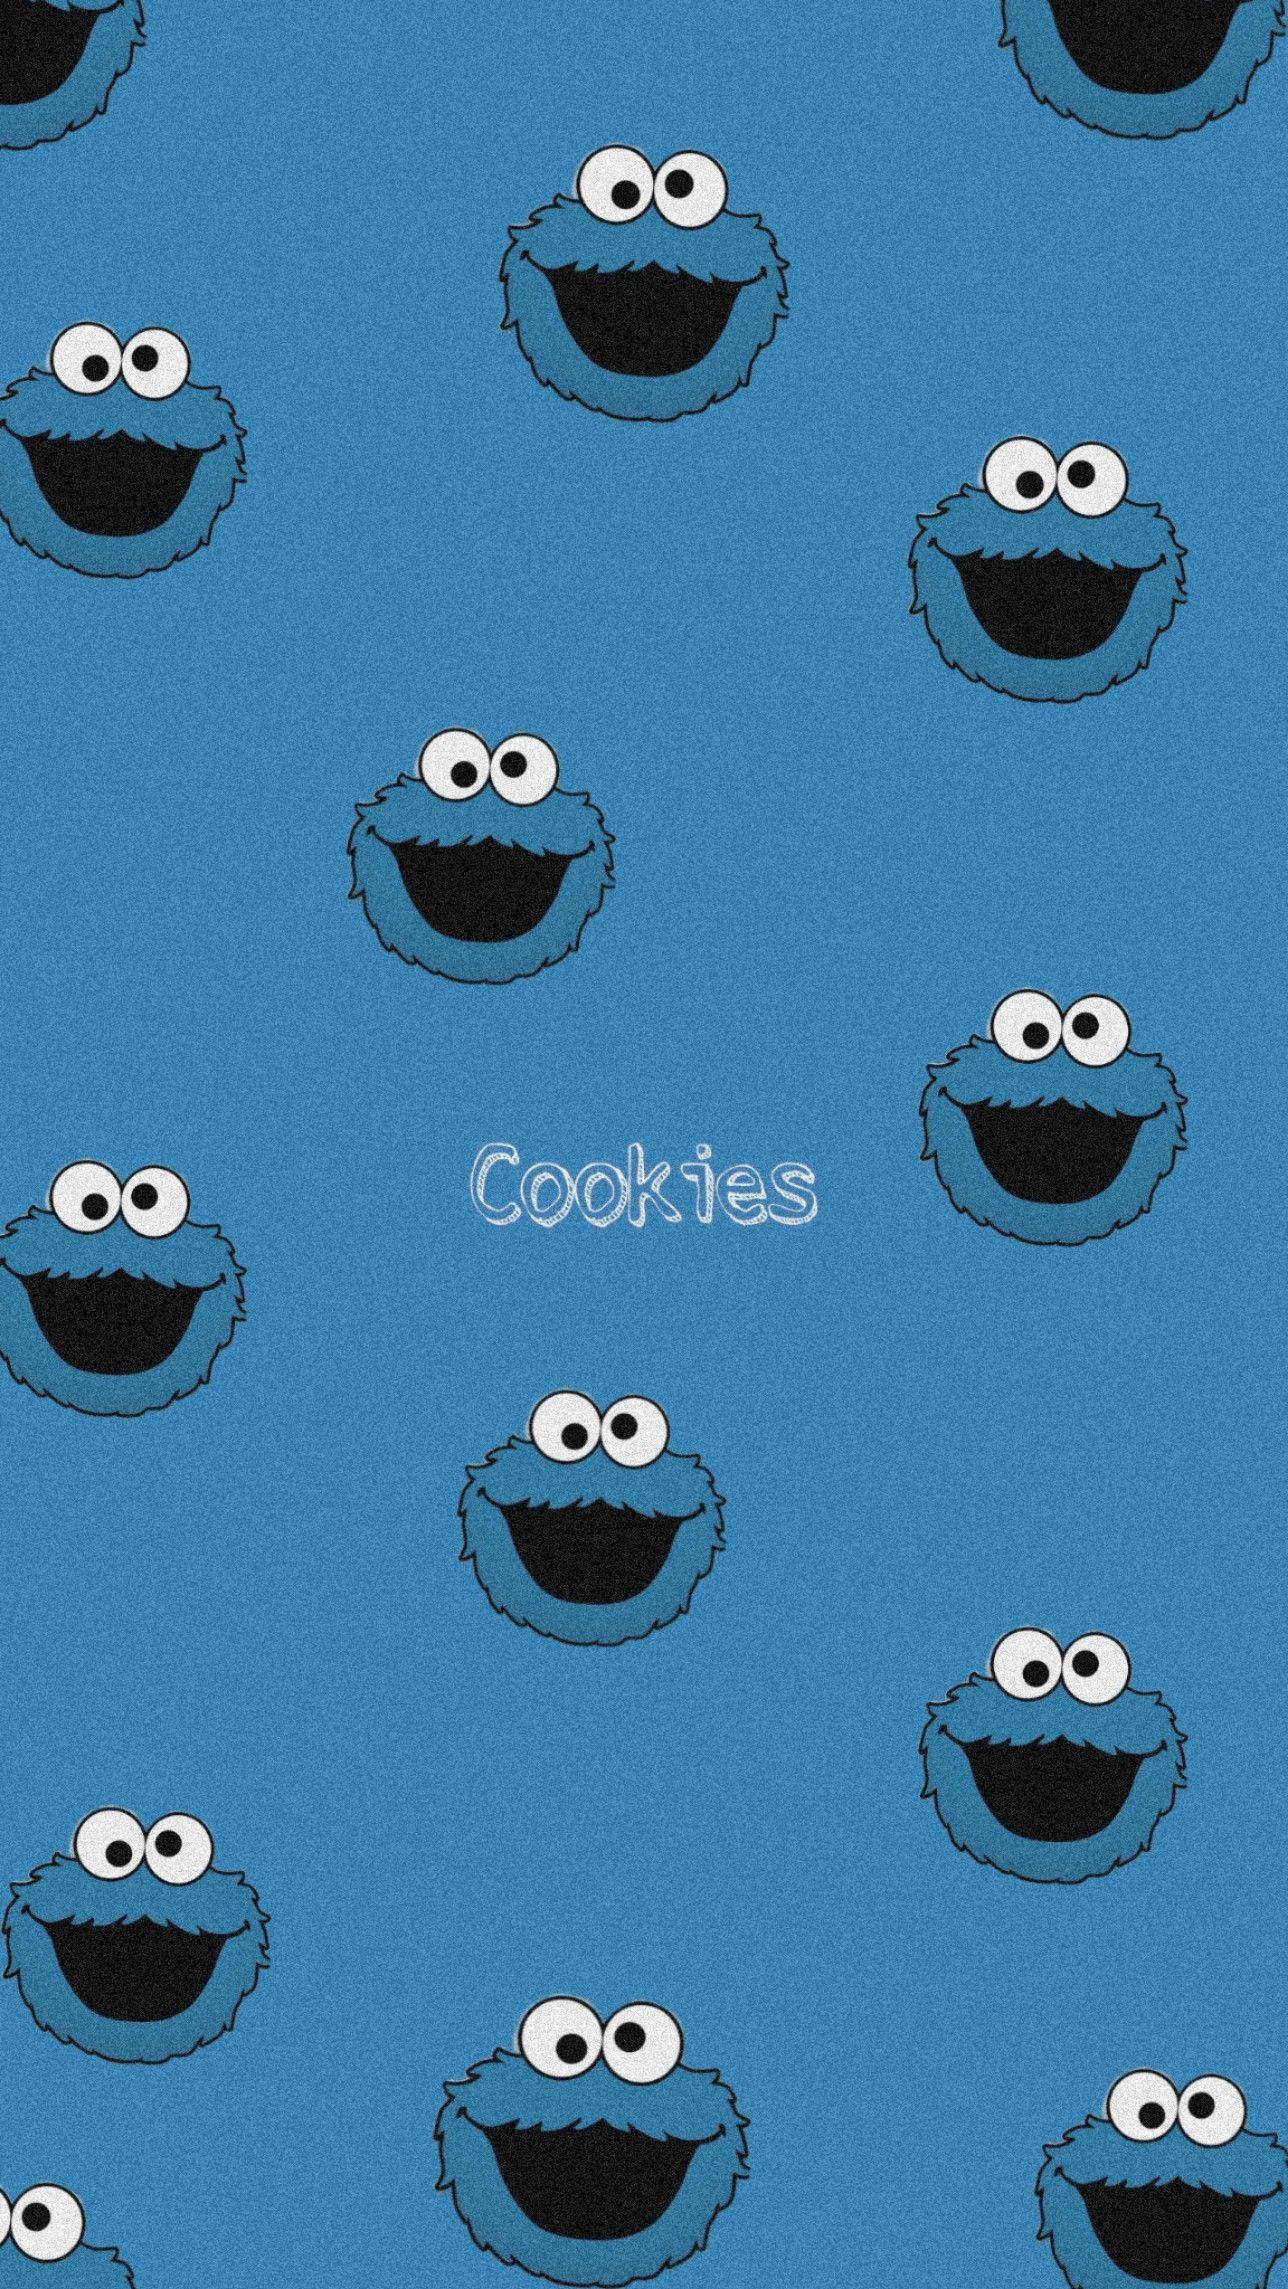 Wallpaper Fondo De Pantalla Cookie Monster Boneka Hewan Gambar Animasi Kartun Kartun